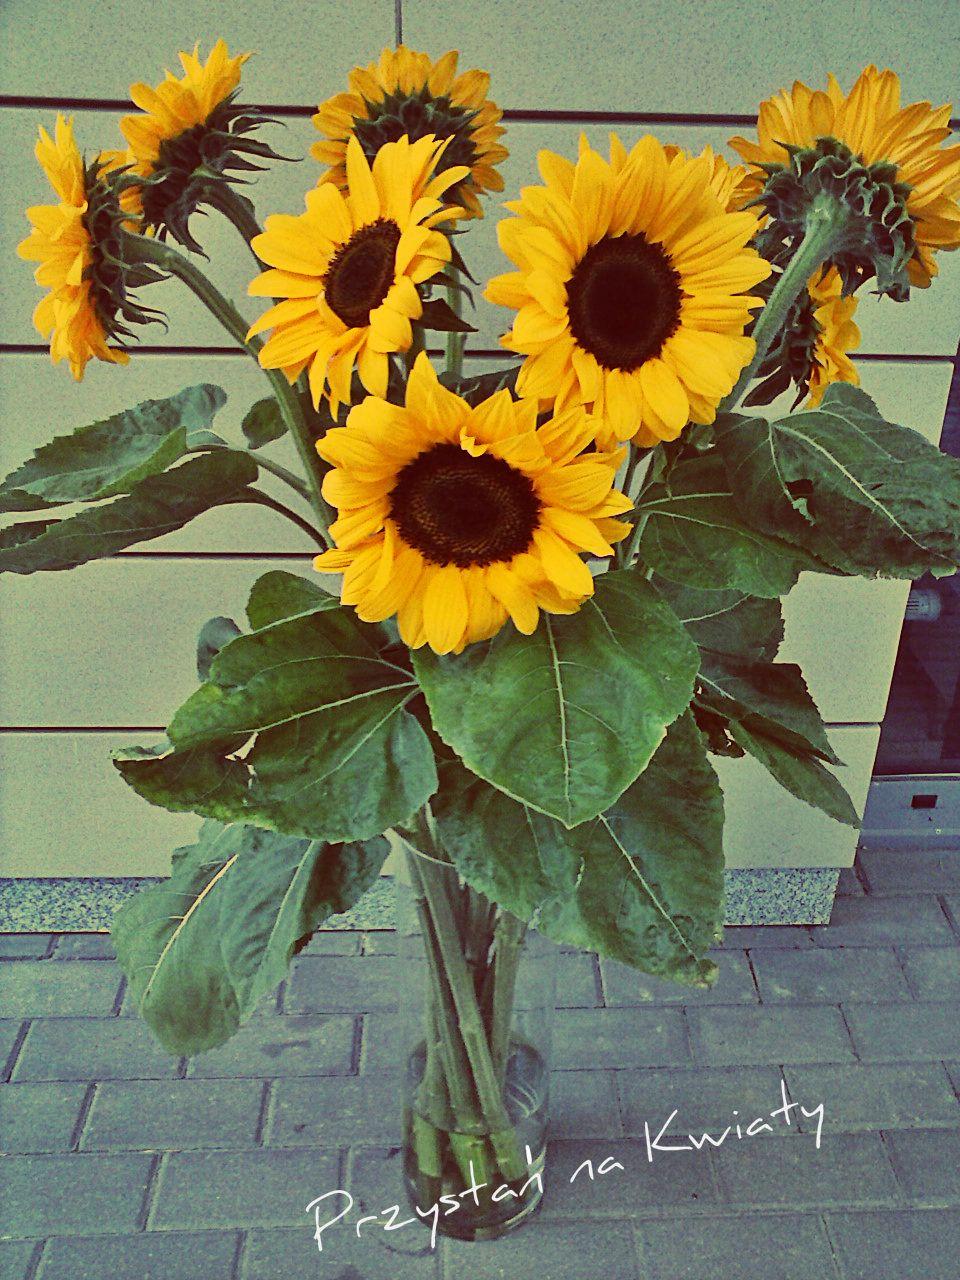 Gigant Sunflowers!